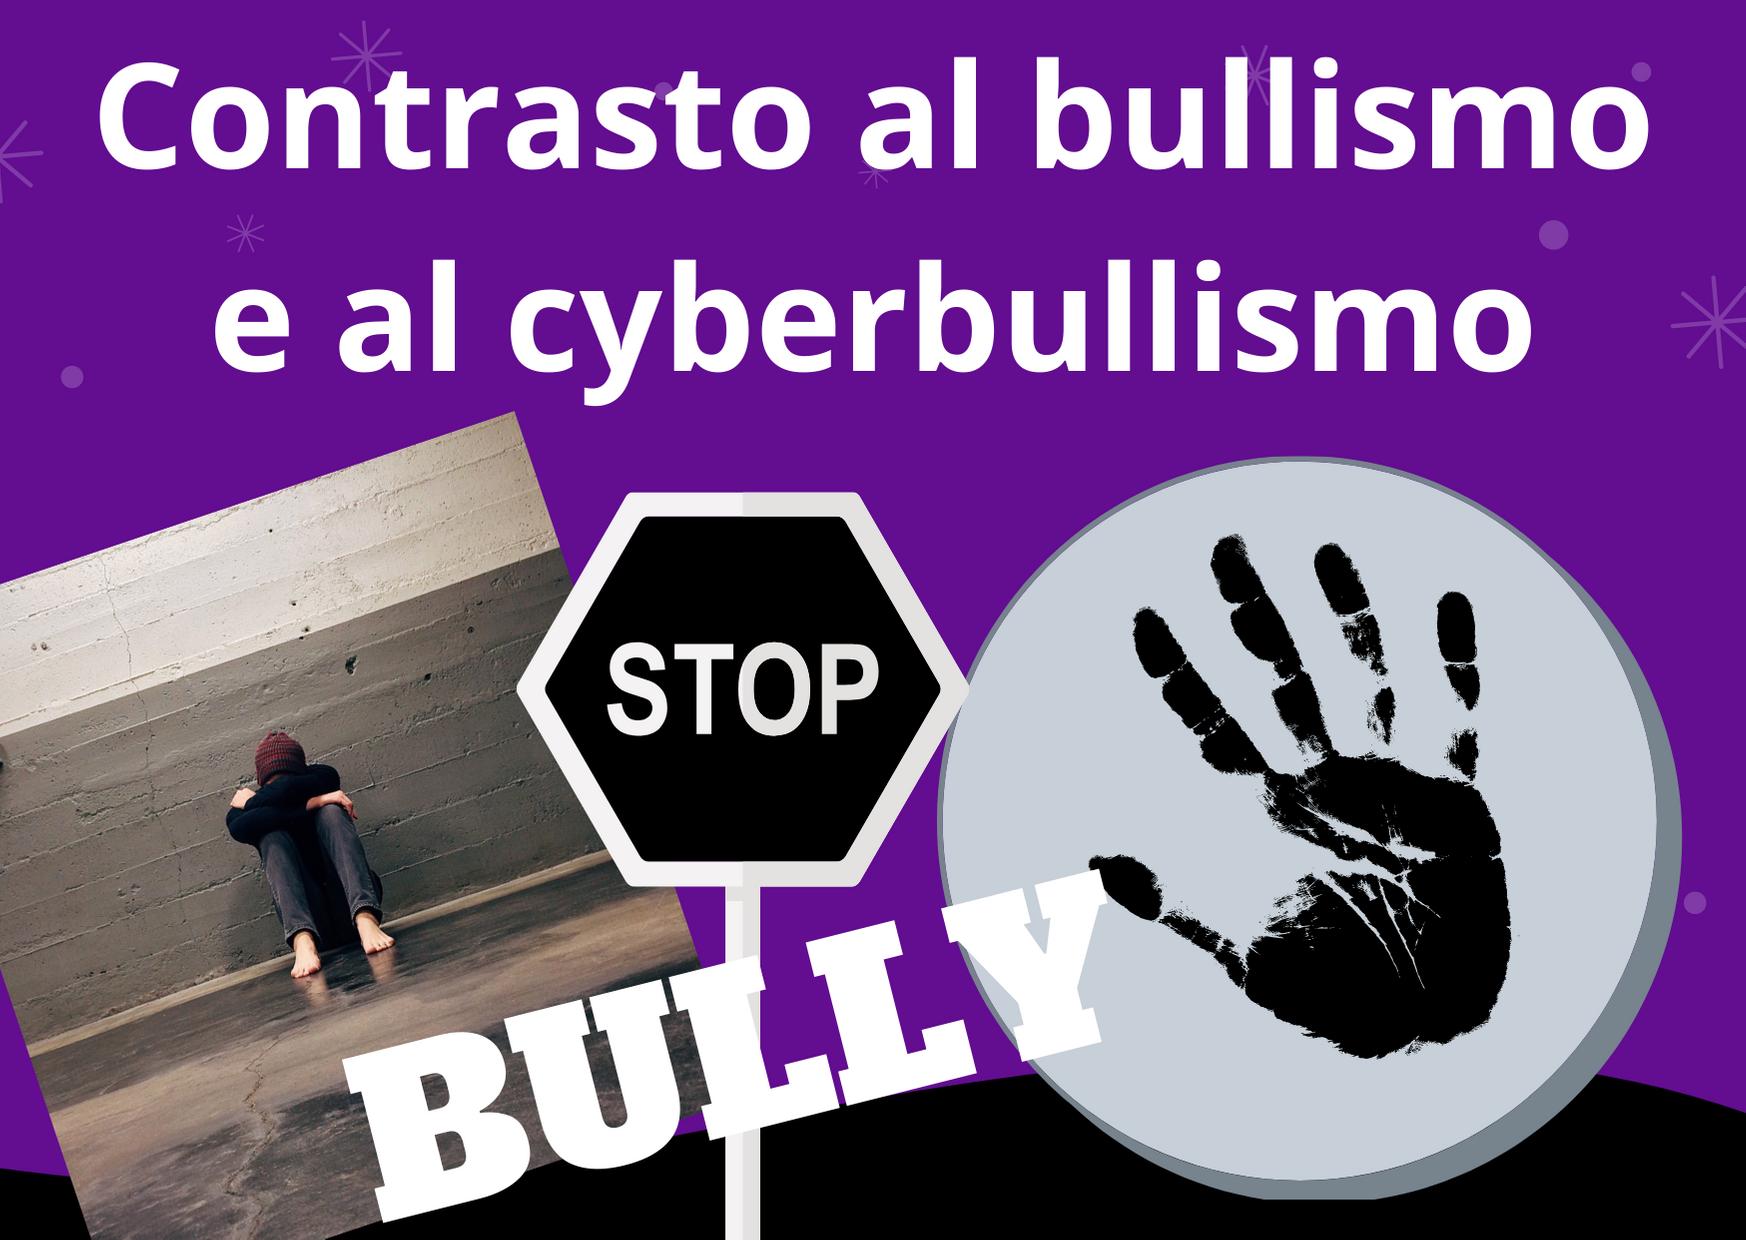 logo link Contrasto al bullismo e al cyberbullismo